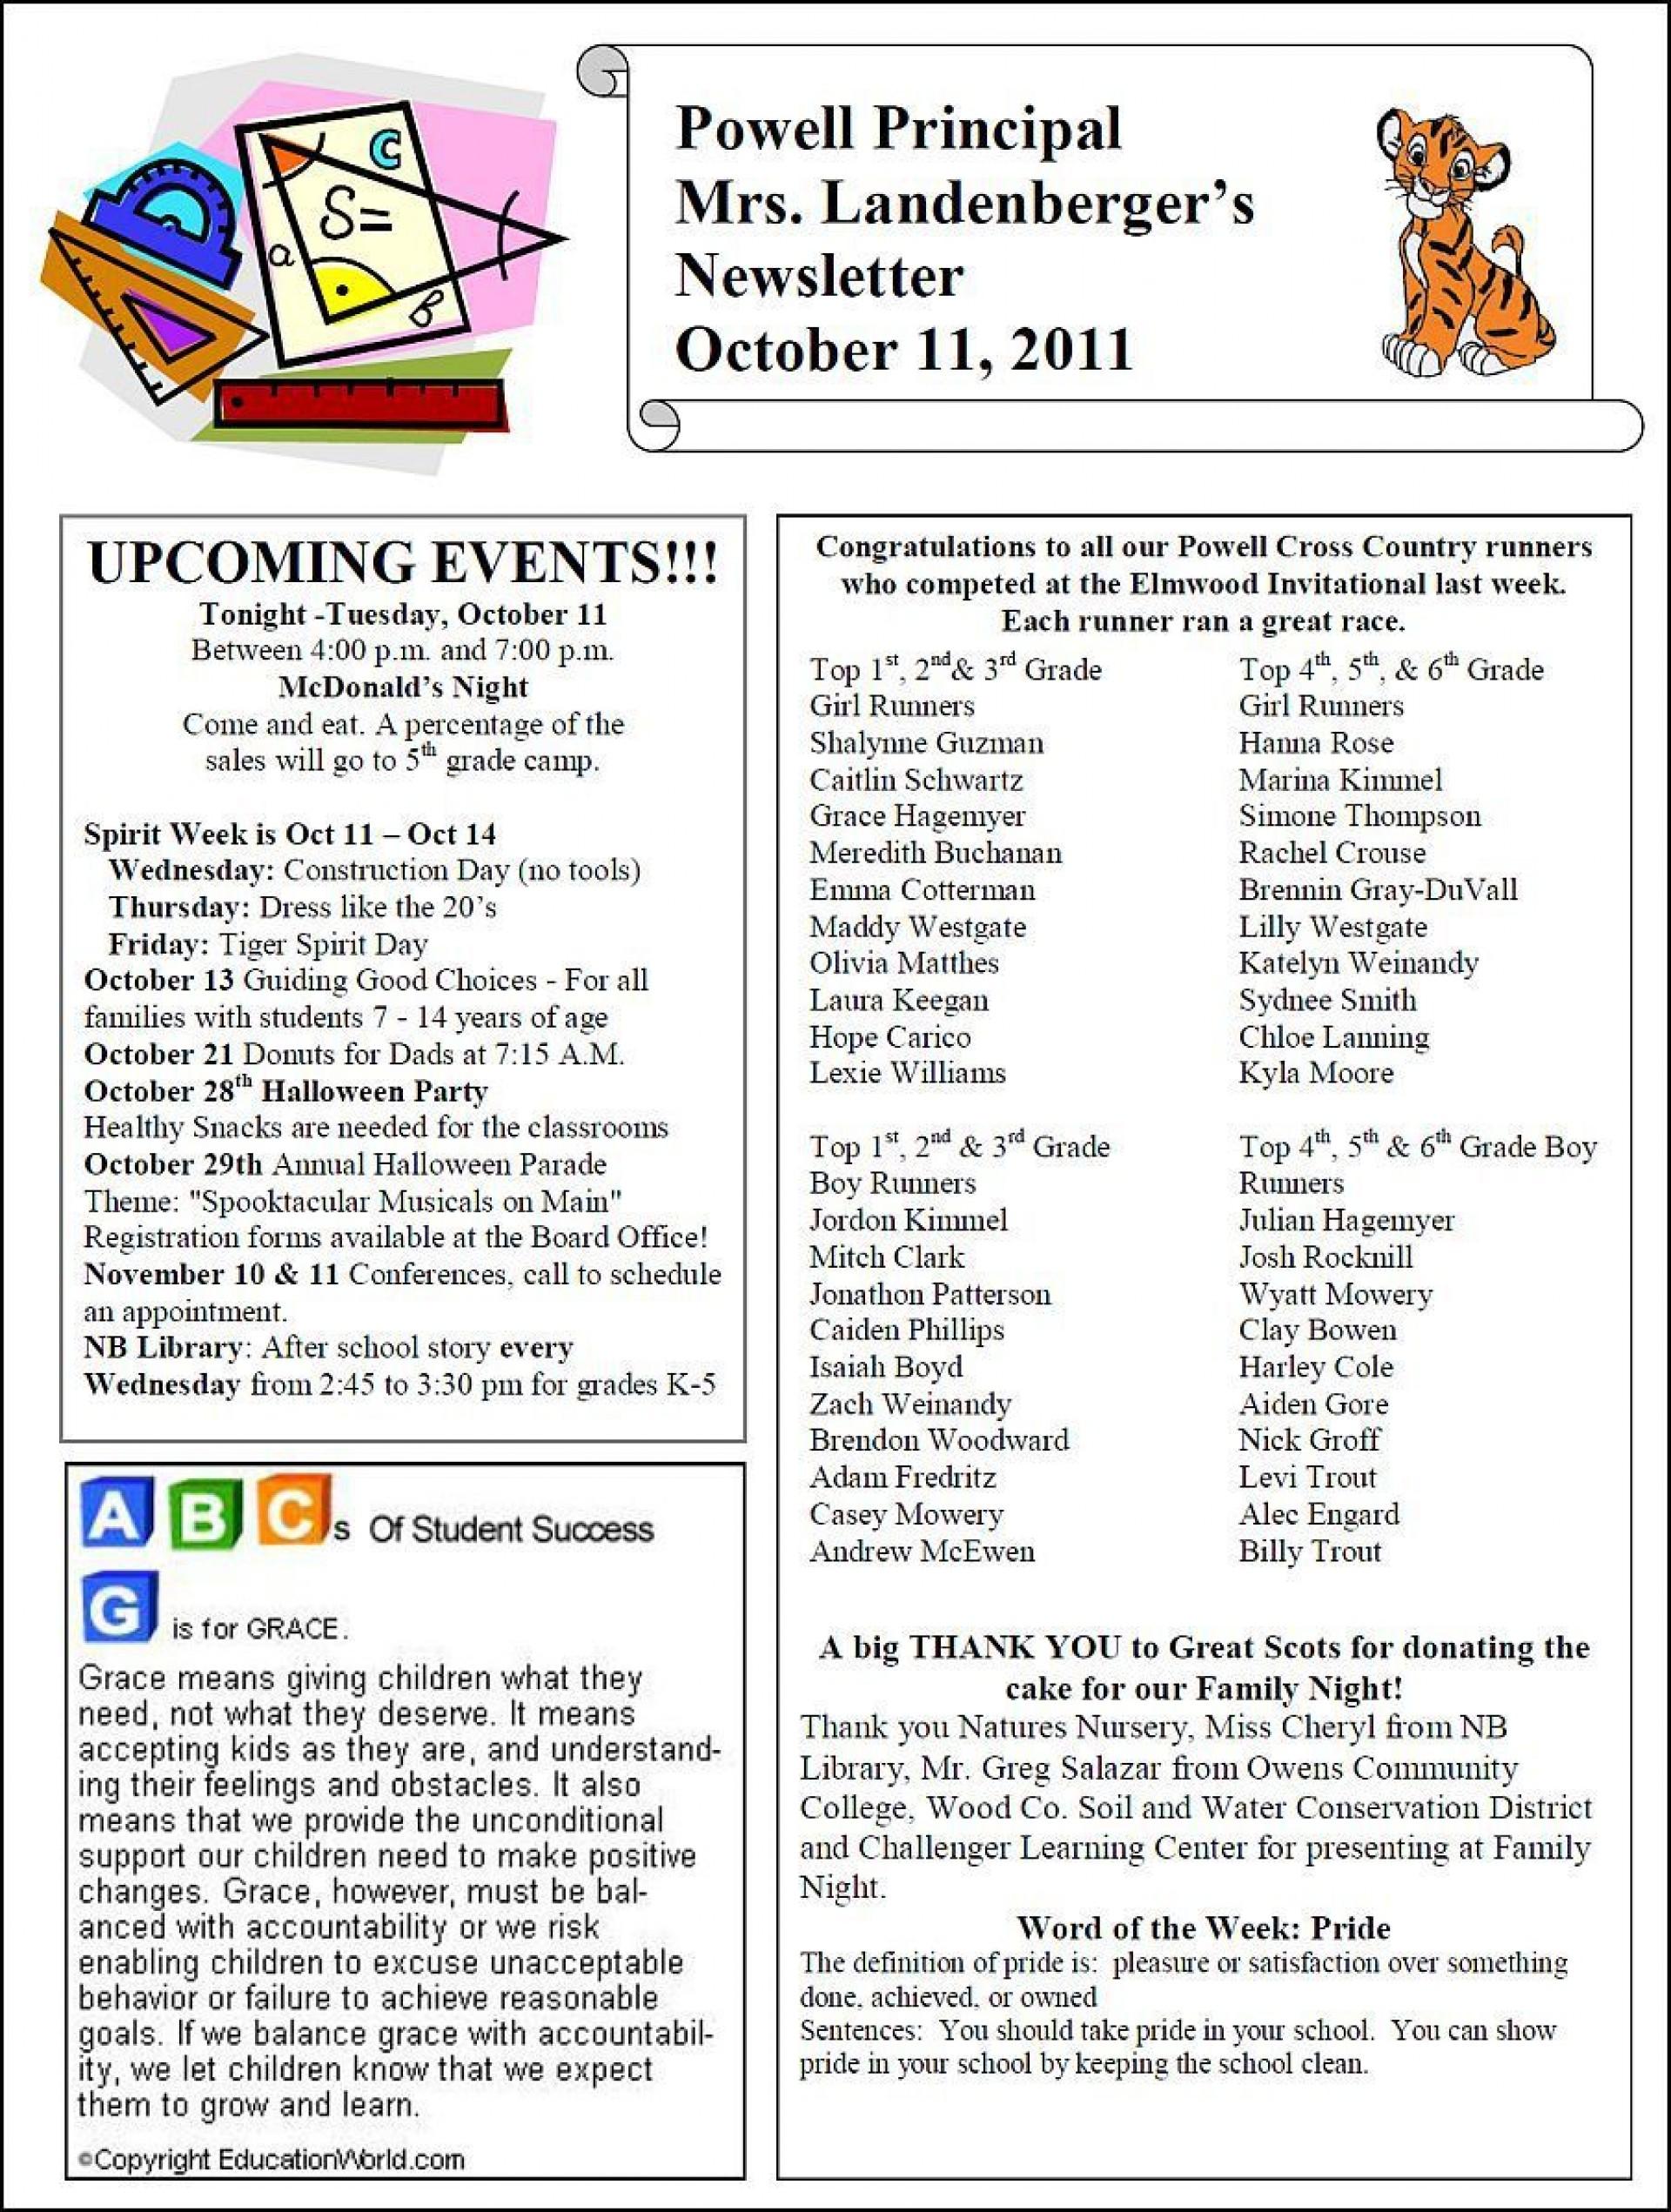 003 Breathtaking Elementary School Newsletter Template Photo  Clas Teacher Free Counselor1920